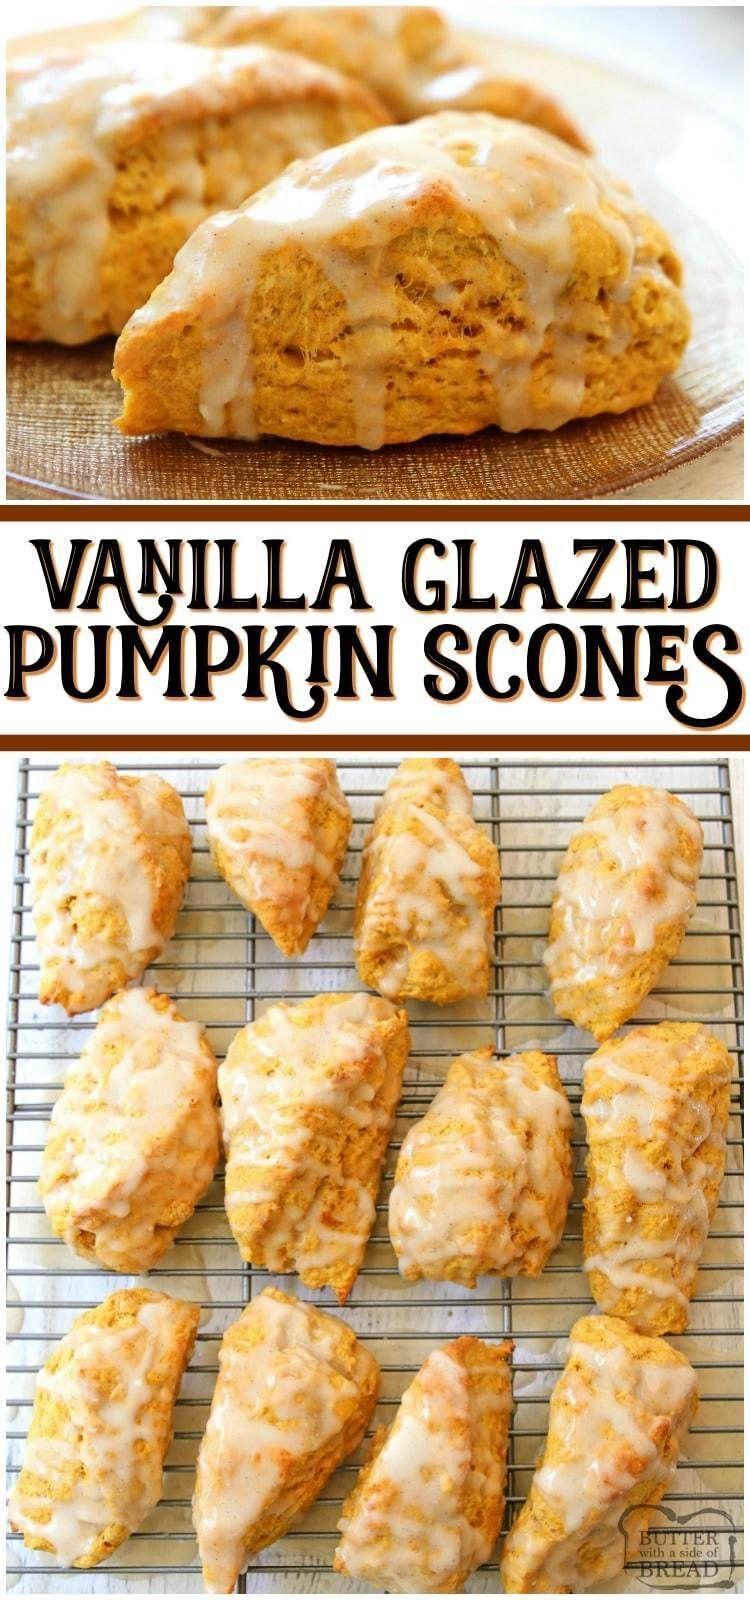 Bridal showers  #pumpkin  #recipes pumpkin recipes, pumpkin chocolate chip cookies, pumpkin spice latte, pumpkin drawing, pumpkin decorating contest, pumpkin aesthetic, pumpkin cake recipes, pumpkin pancakes, pumpkin pie recipe homemade, pumpkin cookies, pumpkin patch, pumpkin soup, pumpkin ravioli, pumpkin puree recipes, pumpkin decorating ideas, pumpkin cheesecake recipes, pumpkin pancakes recipe, pumpkin cake, pumpkin carving, pumpkin tattoo, pumpkin carving ideas templates, pumpkin ideas, pu